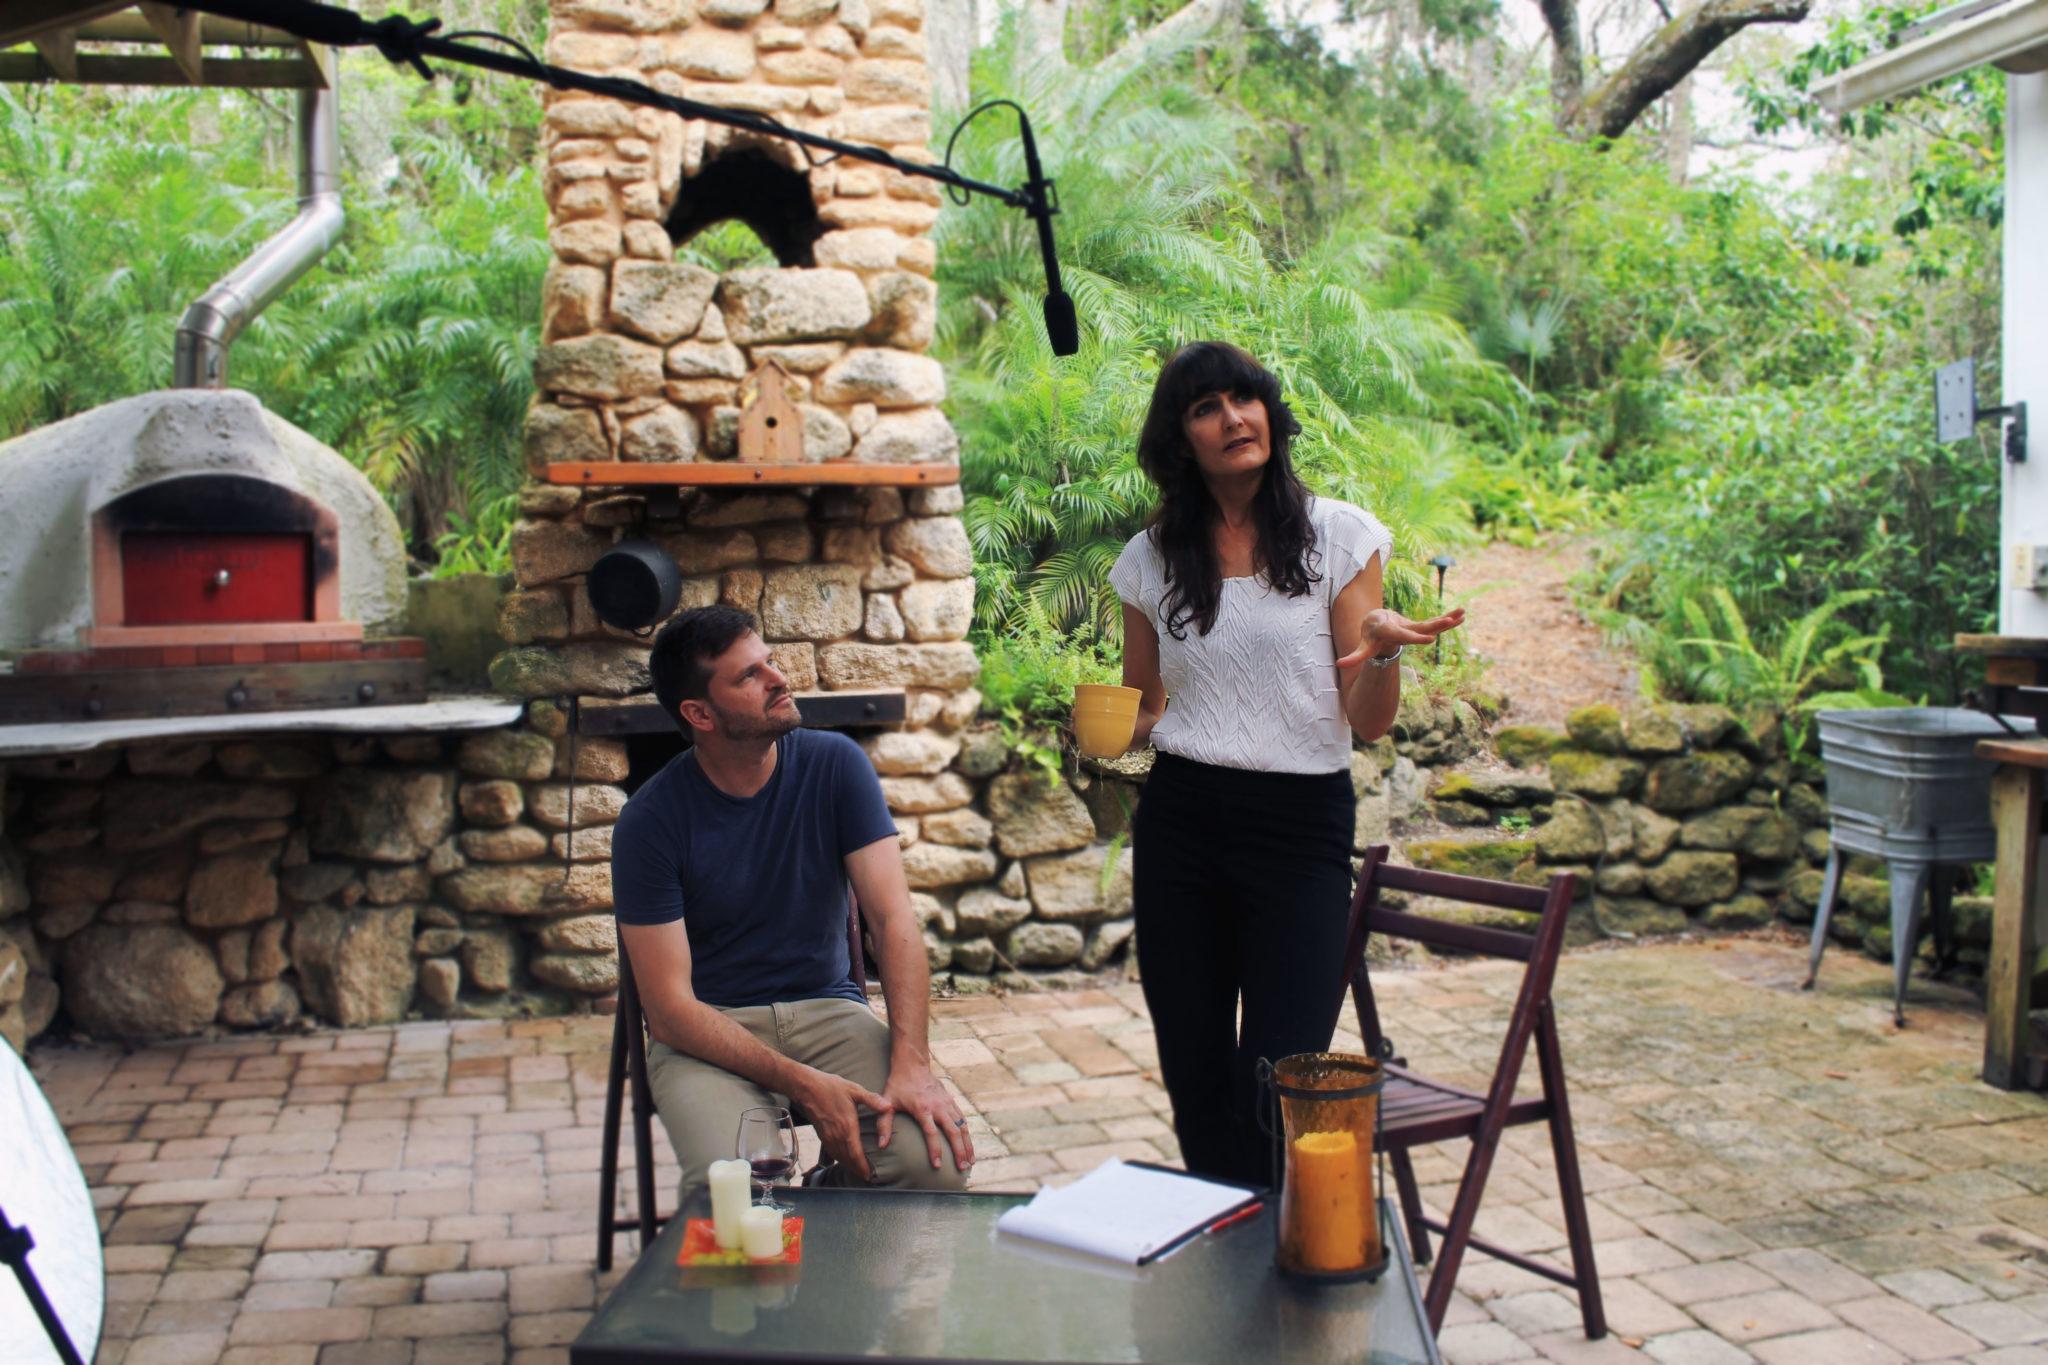 social ministry and now a tech company founder David Pezzoli talks to Pam Hoelzle at Dear Rockstar